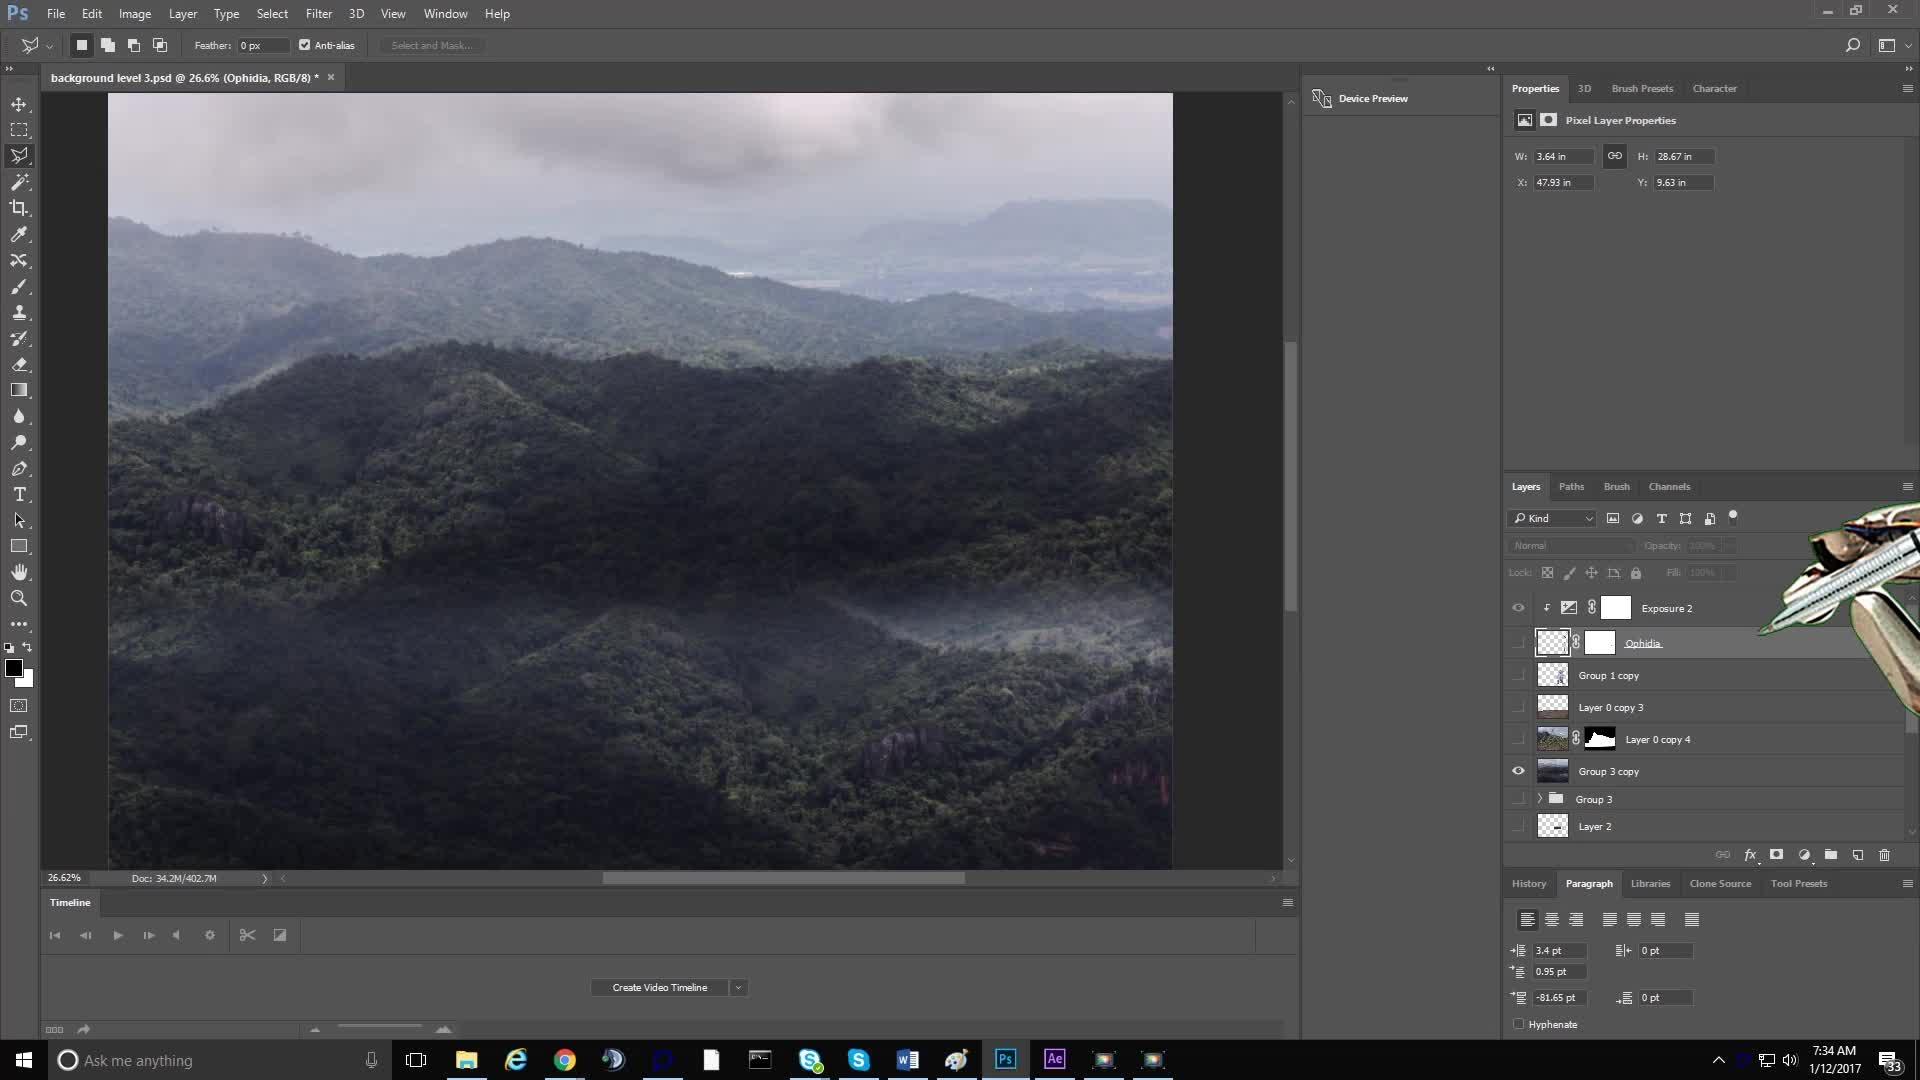 CreationGifs, photoshopbattles, Baby witch overlooking Machu Piccu (reddit) GIFs